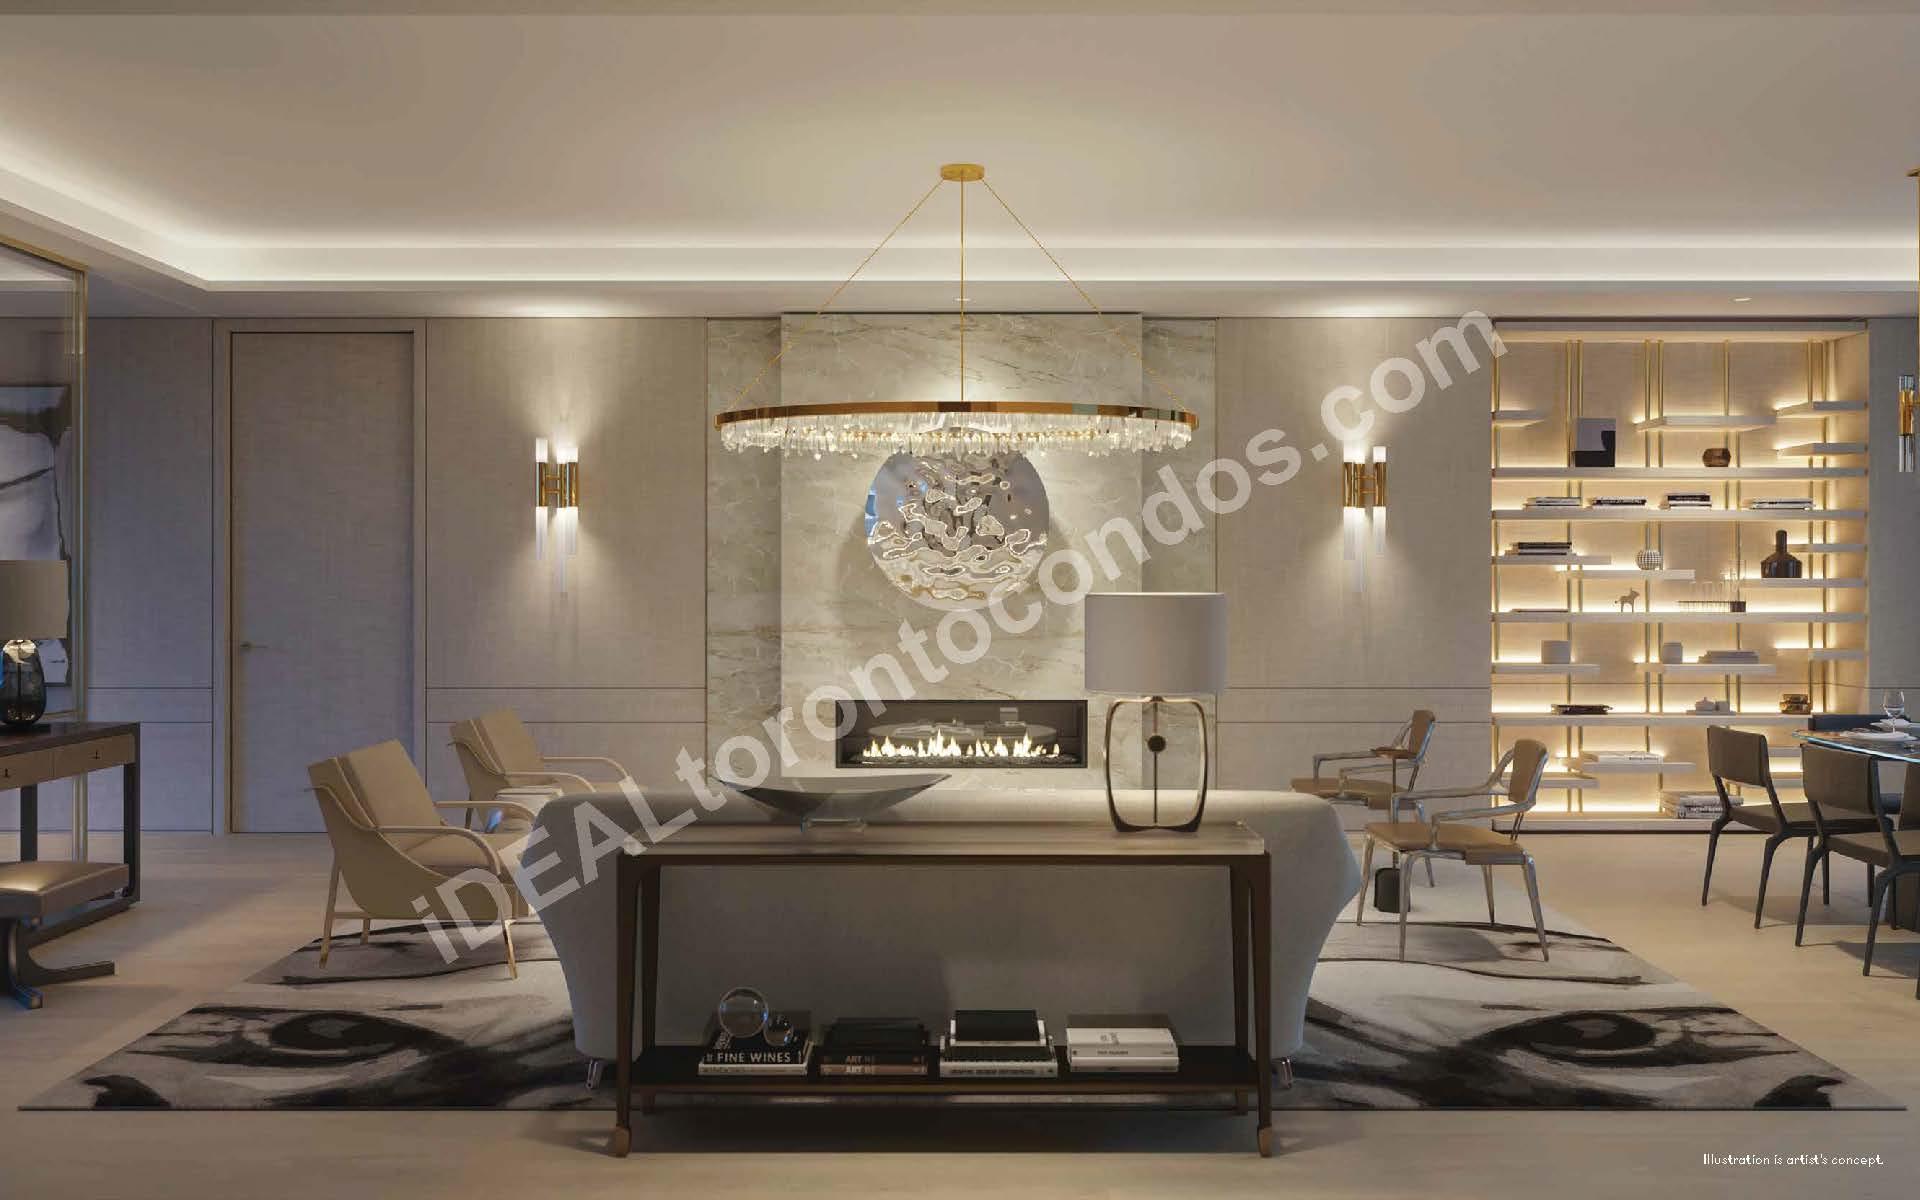 50 Scollard residence_01